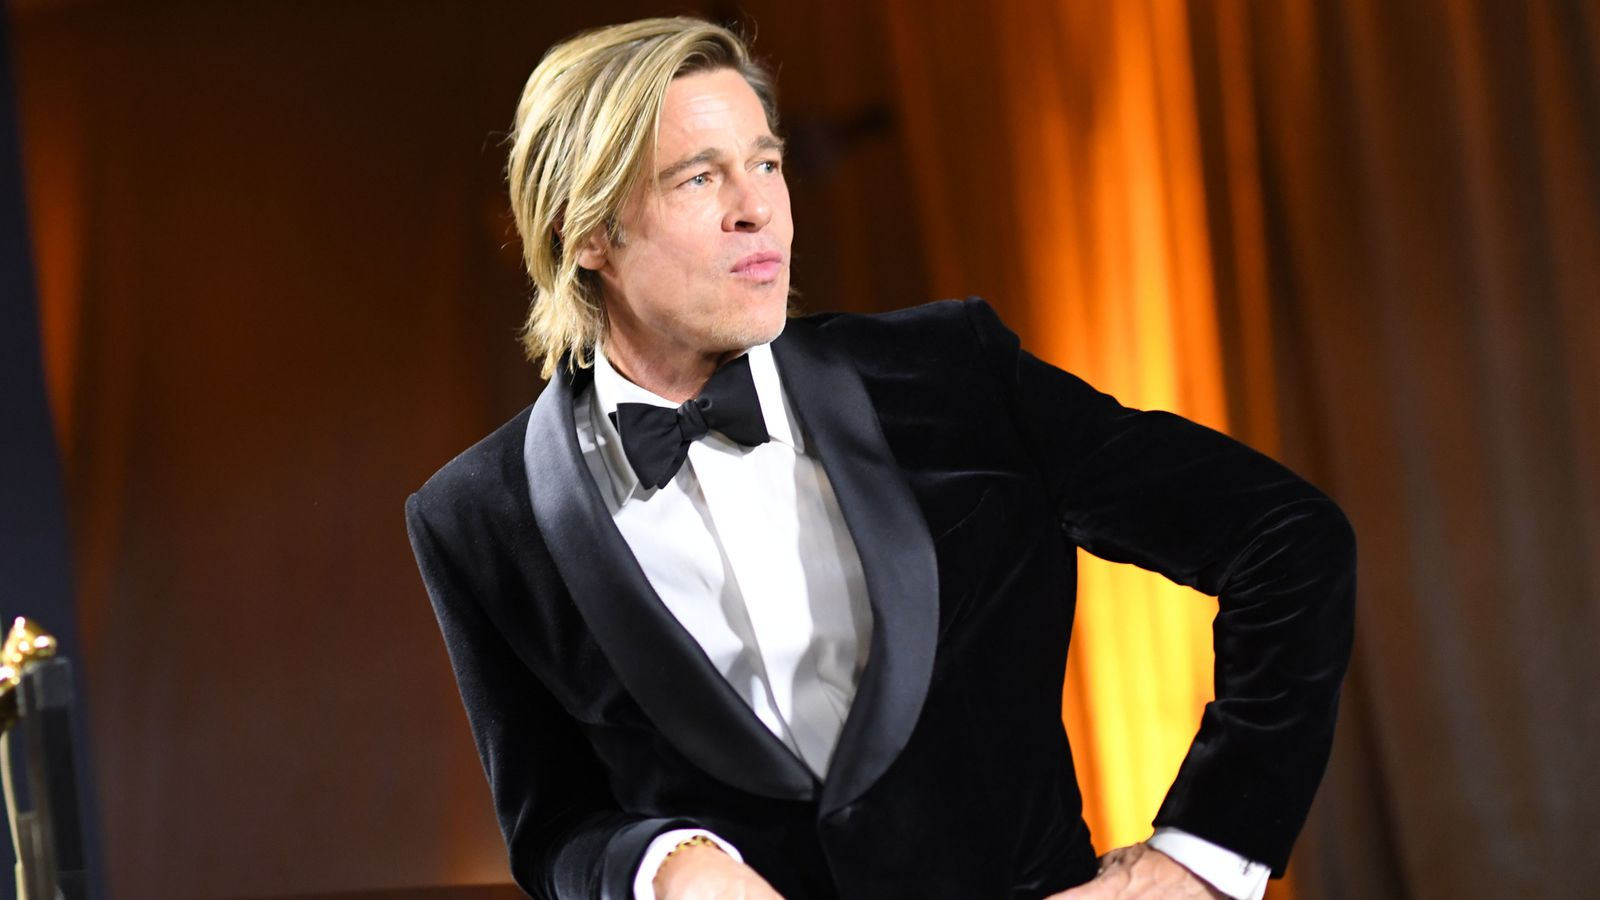 Oscars: Parasite, Brad Pitt, Renee Zellweger and more - Sky News